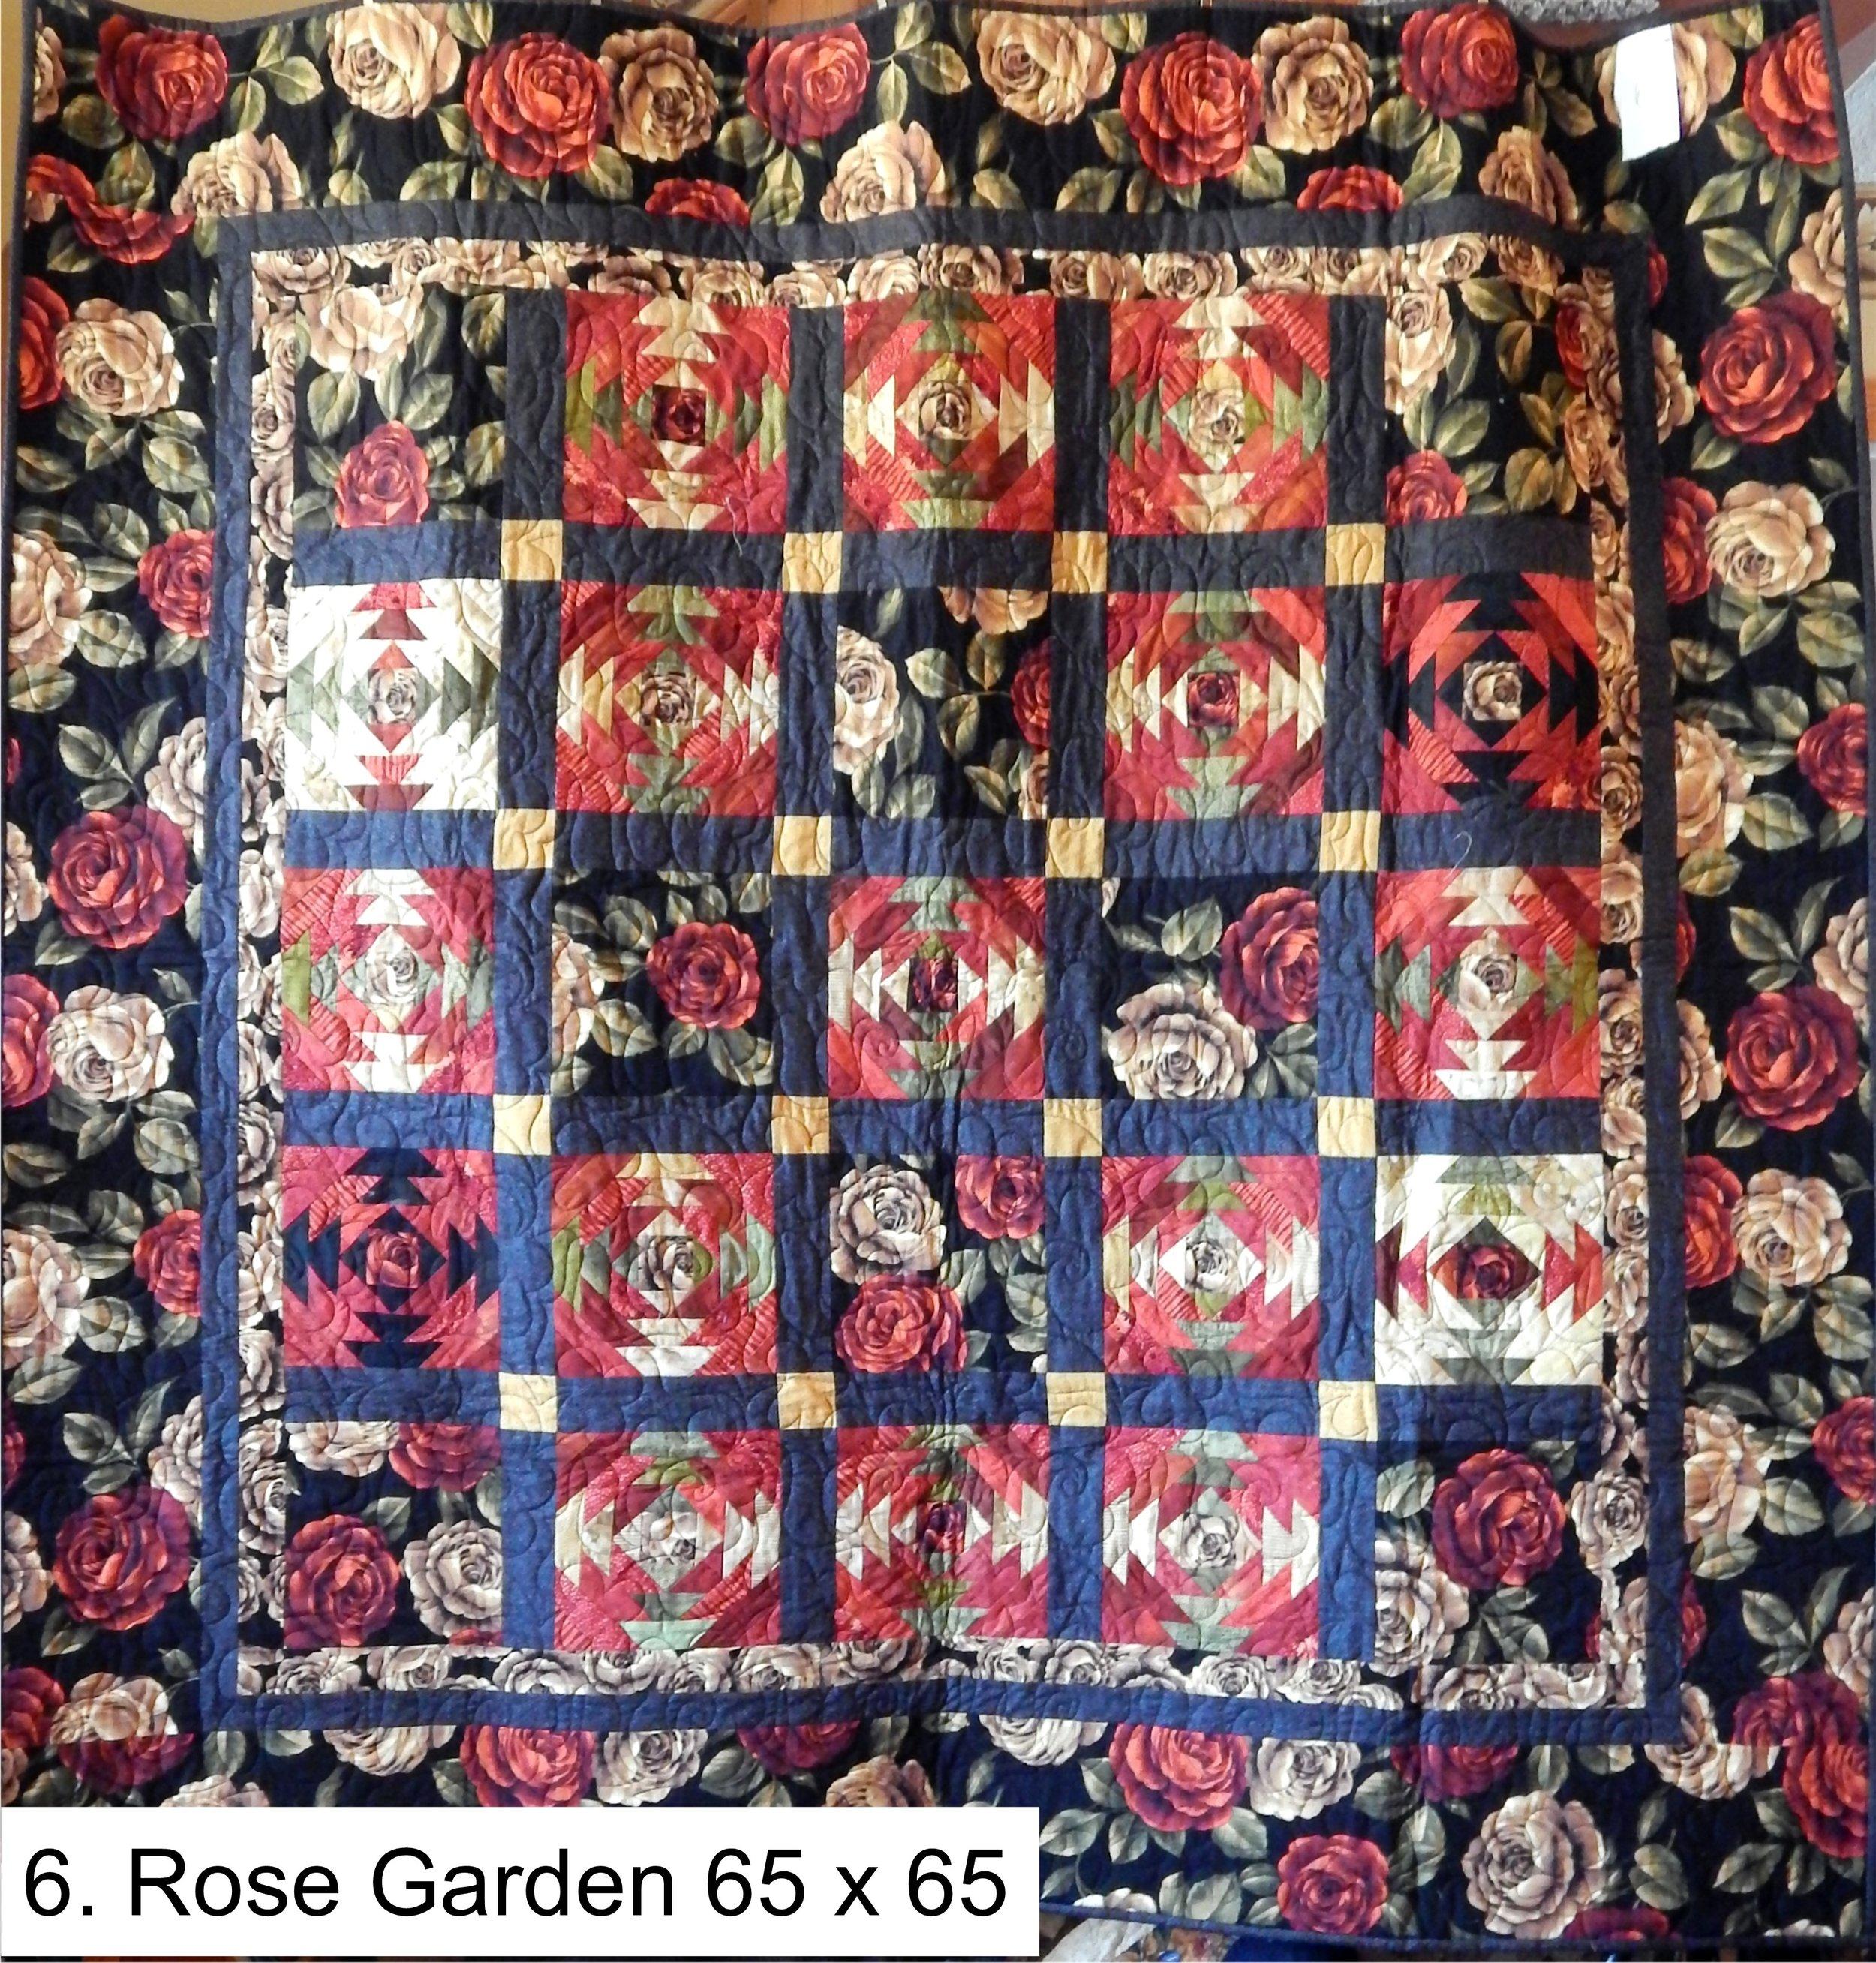 6. Rose Garden 65 x 65.JPG